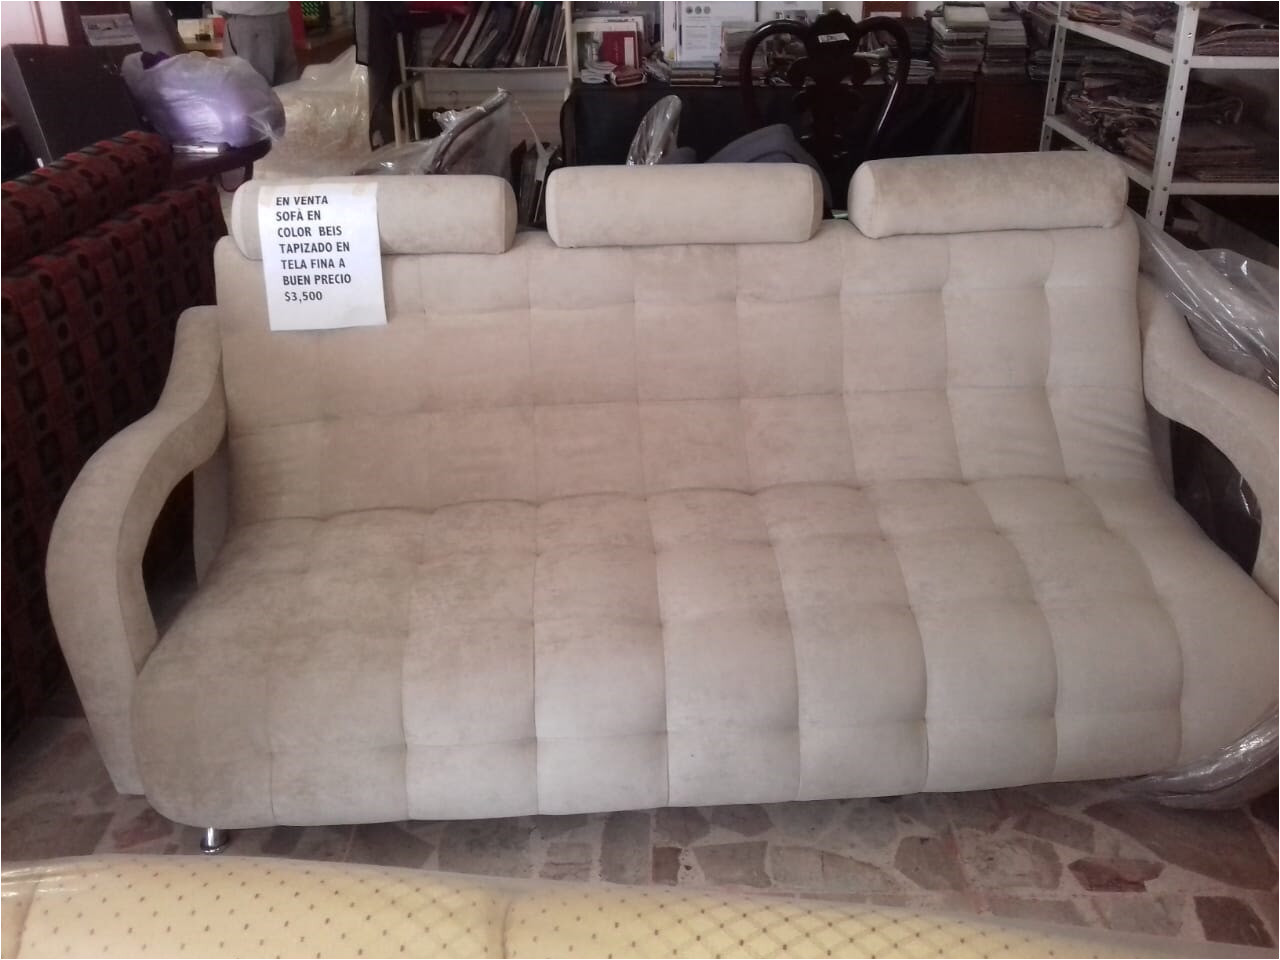 tapicerias obregon sofa 3 plazas color beige tapizado en tela fina a excelente precio